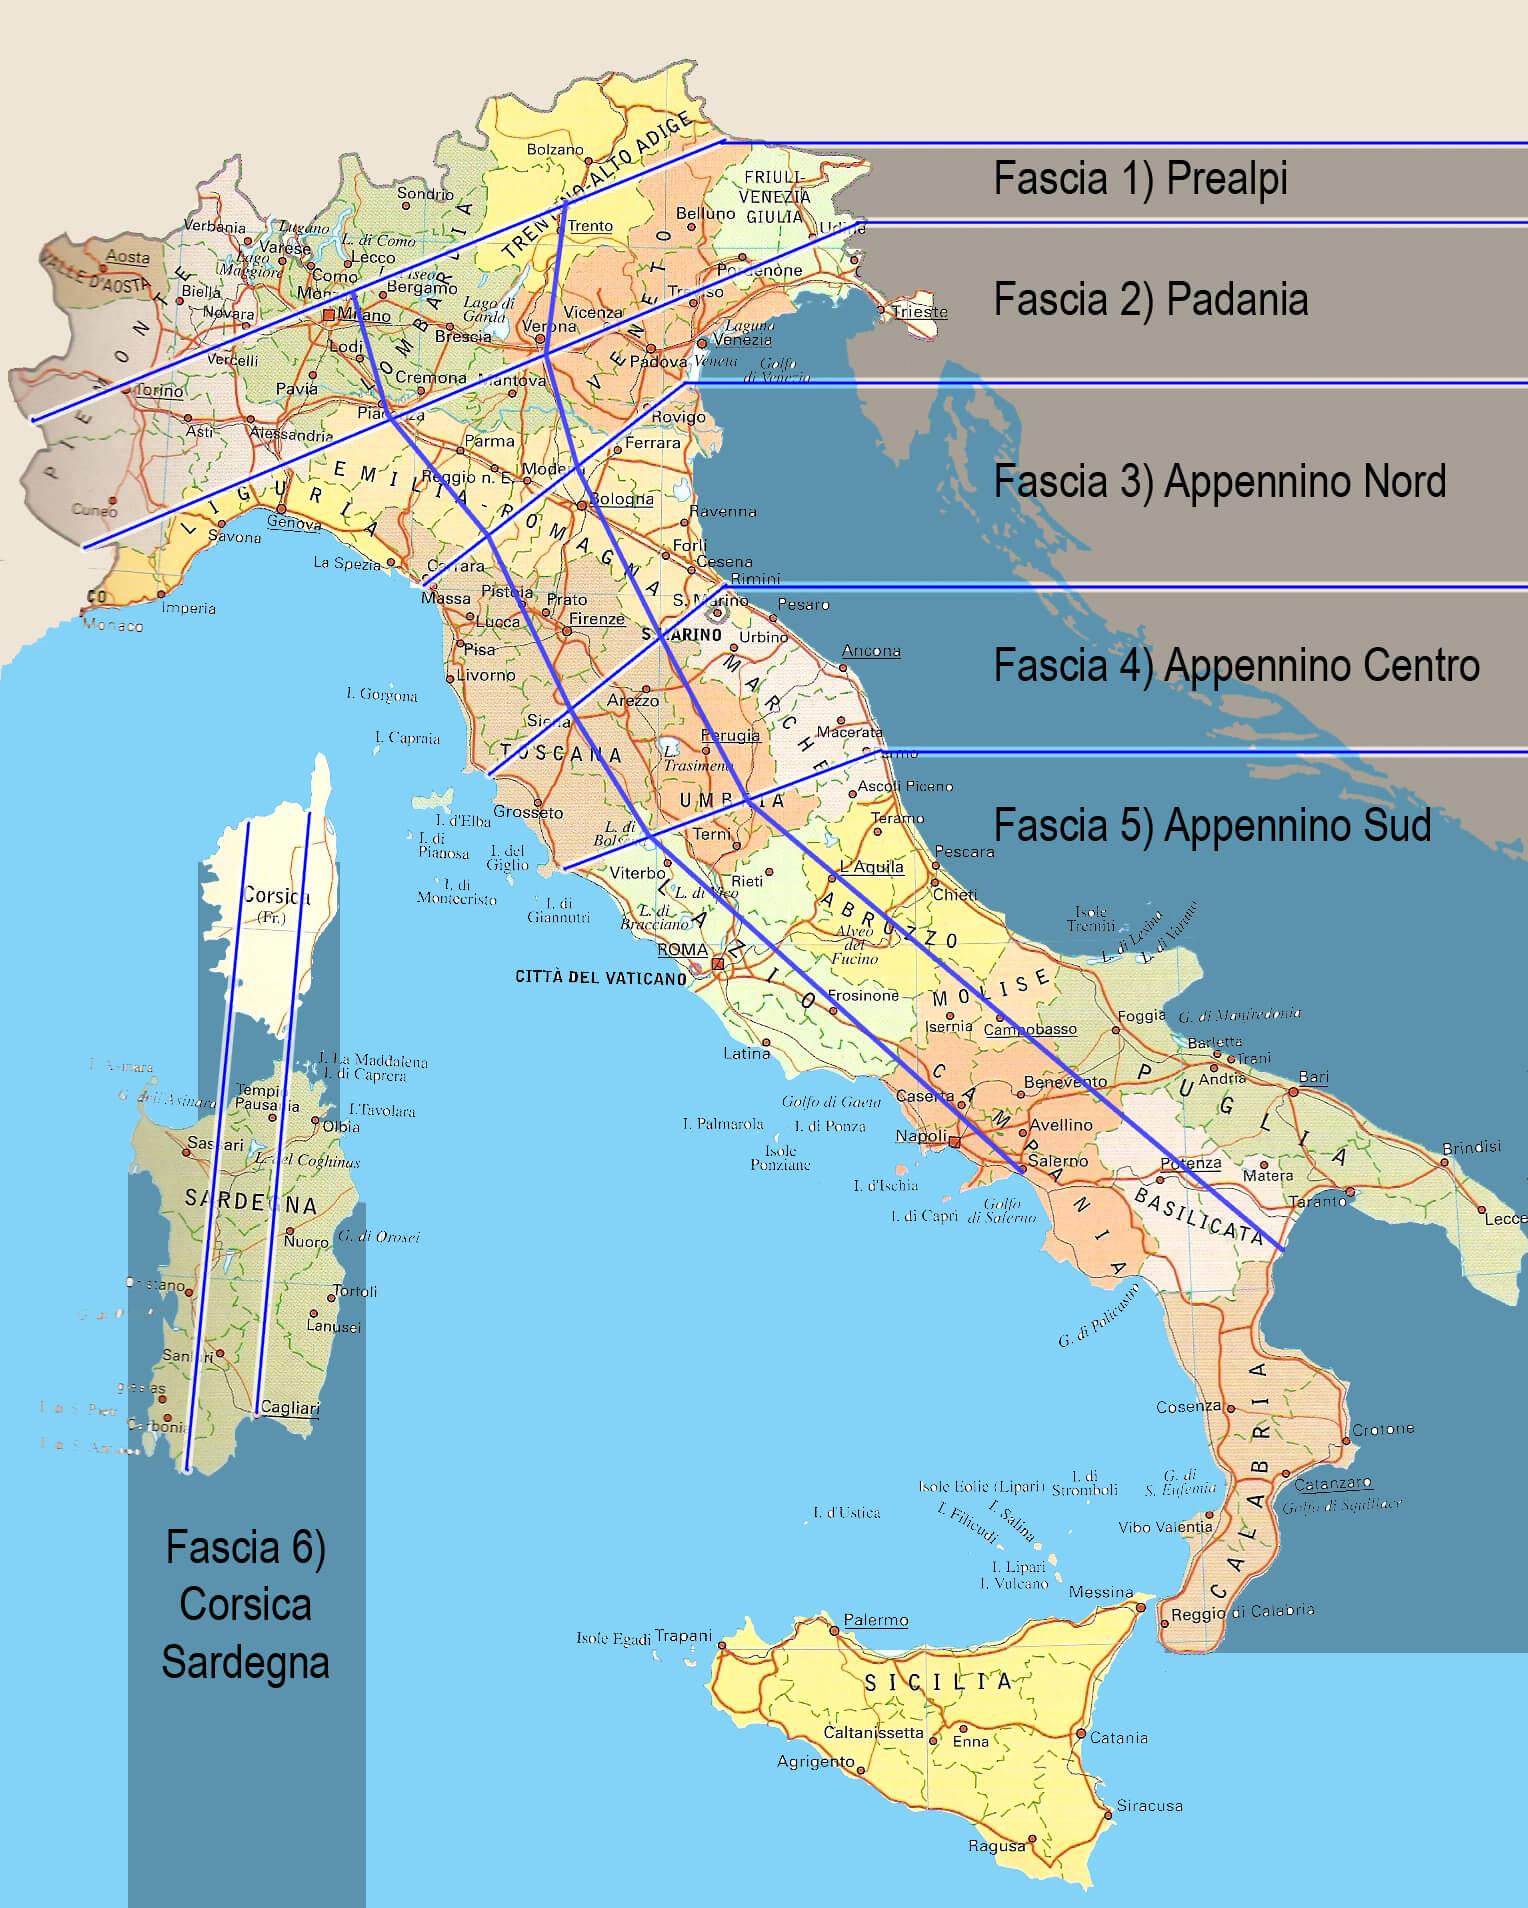 mappa cartina politica italia fasce